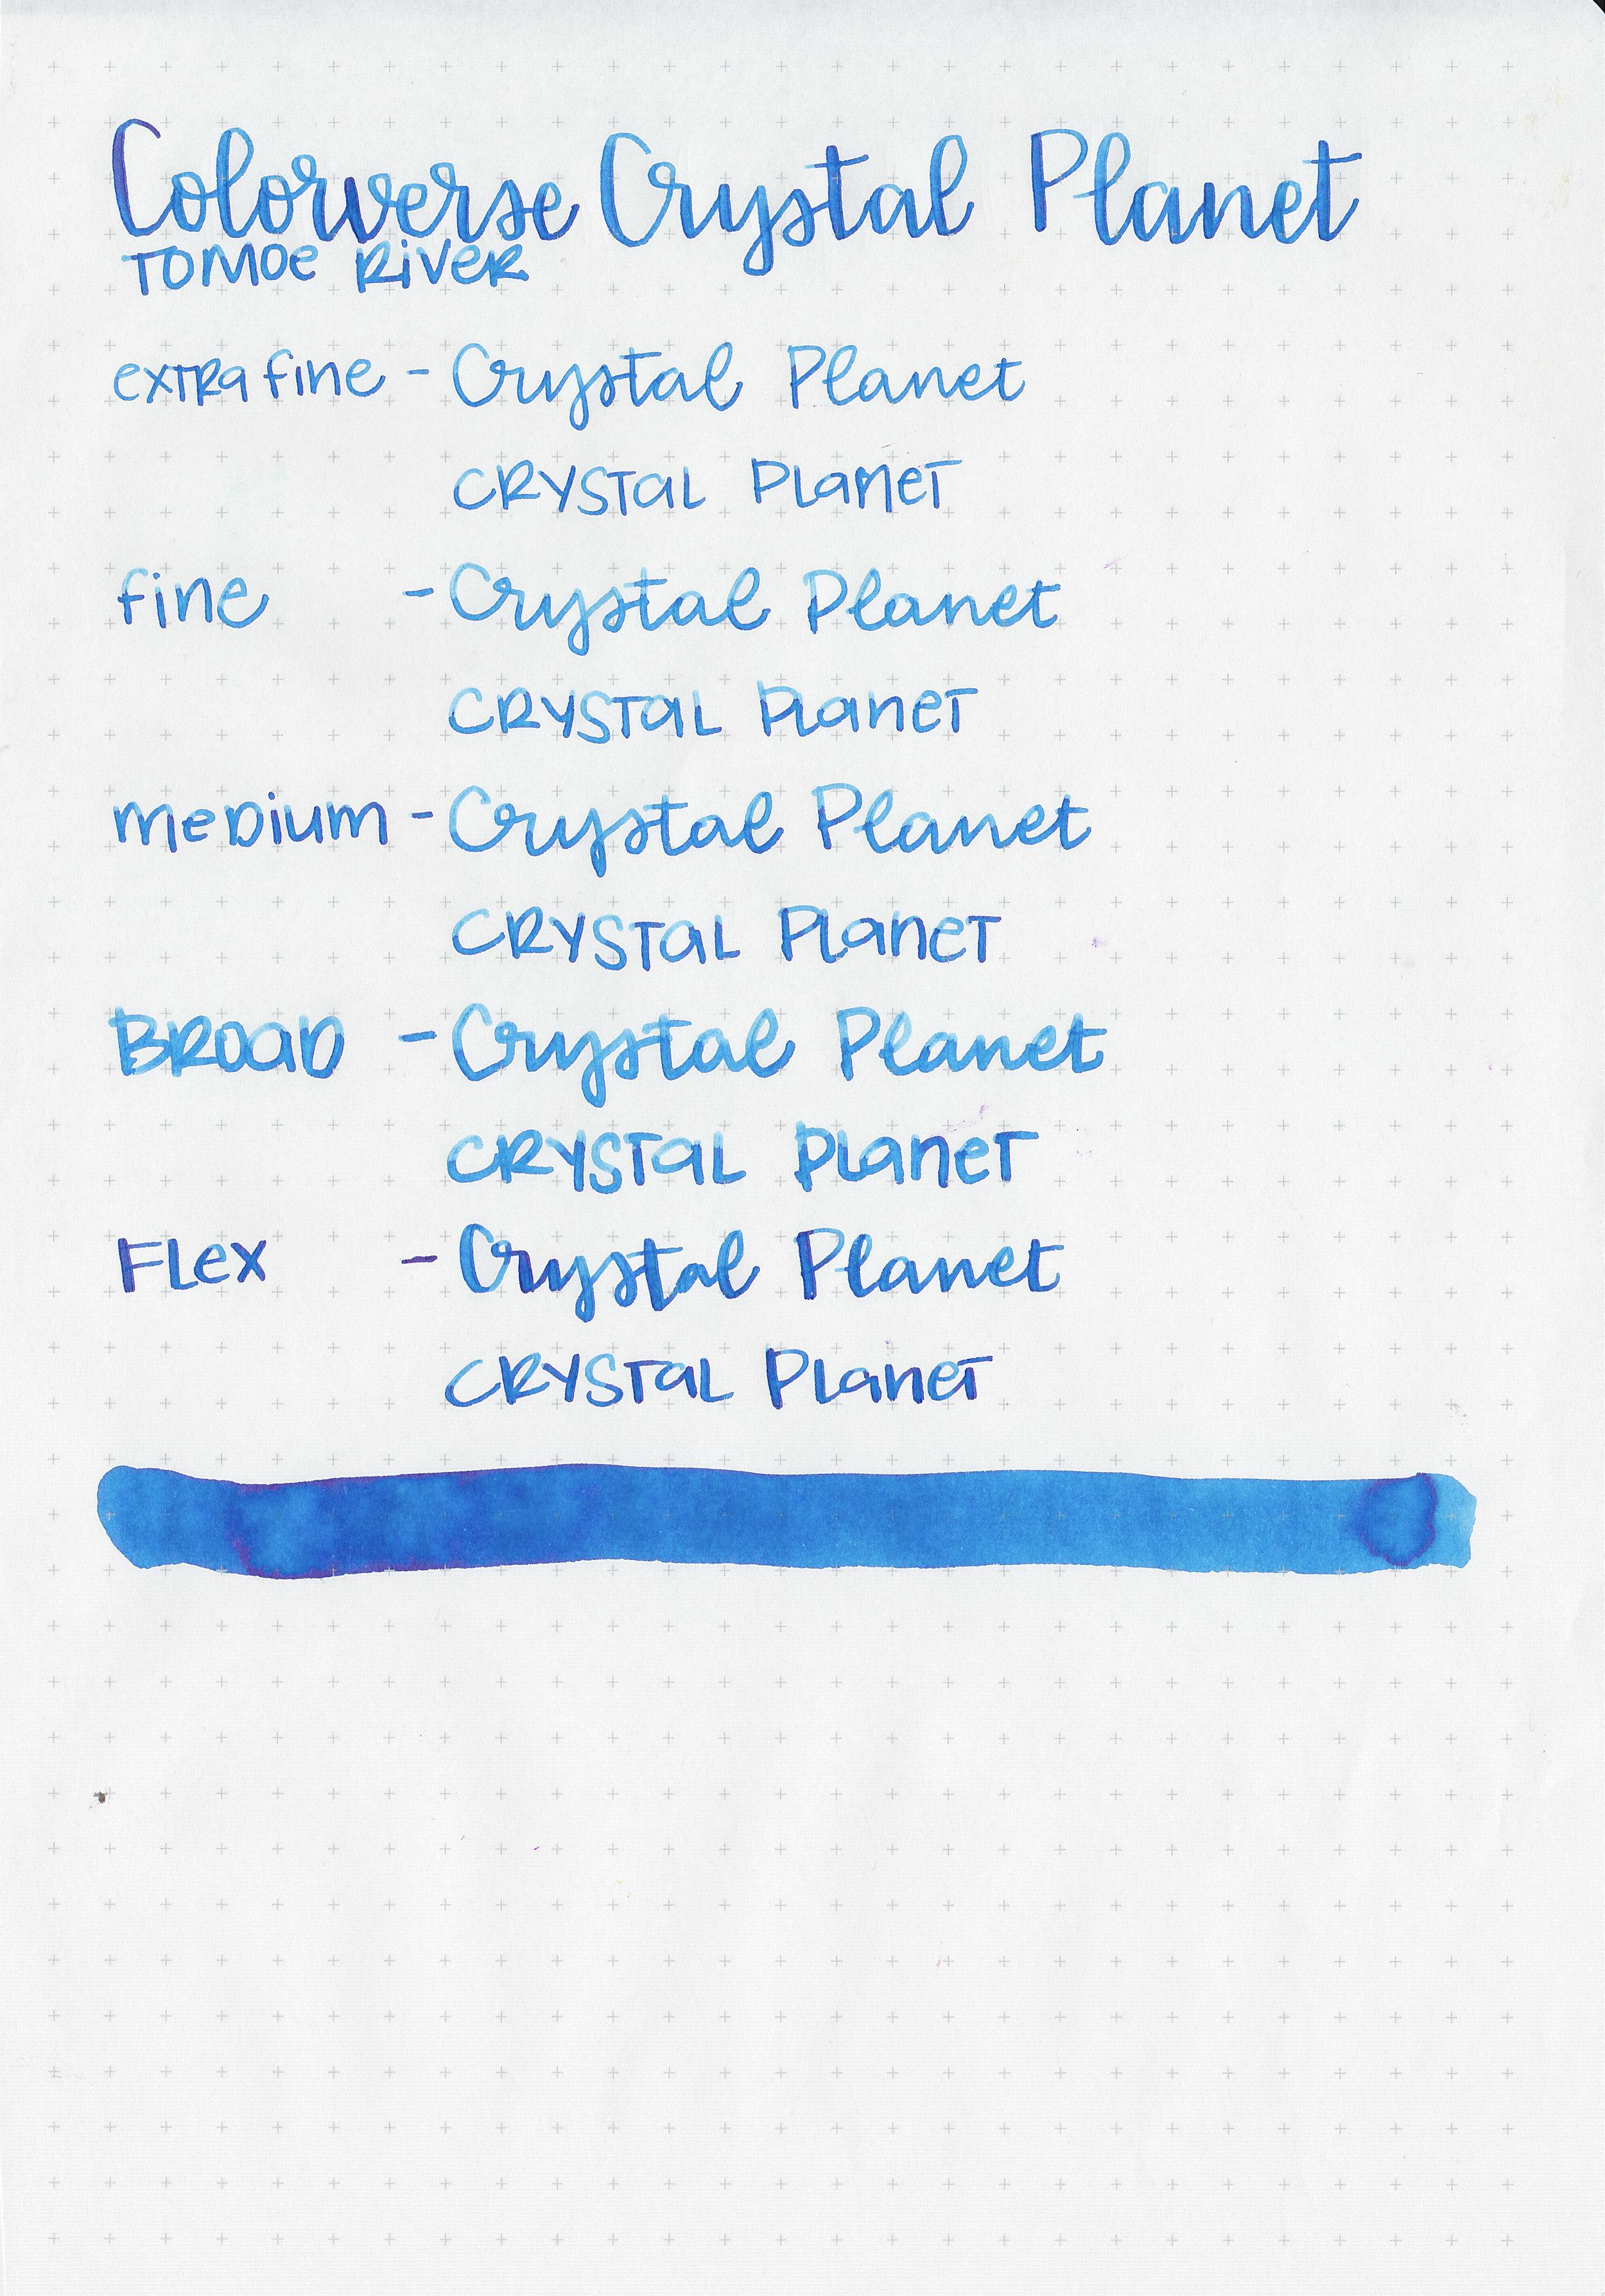 cv-crystal-planet-7.jpg